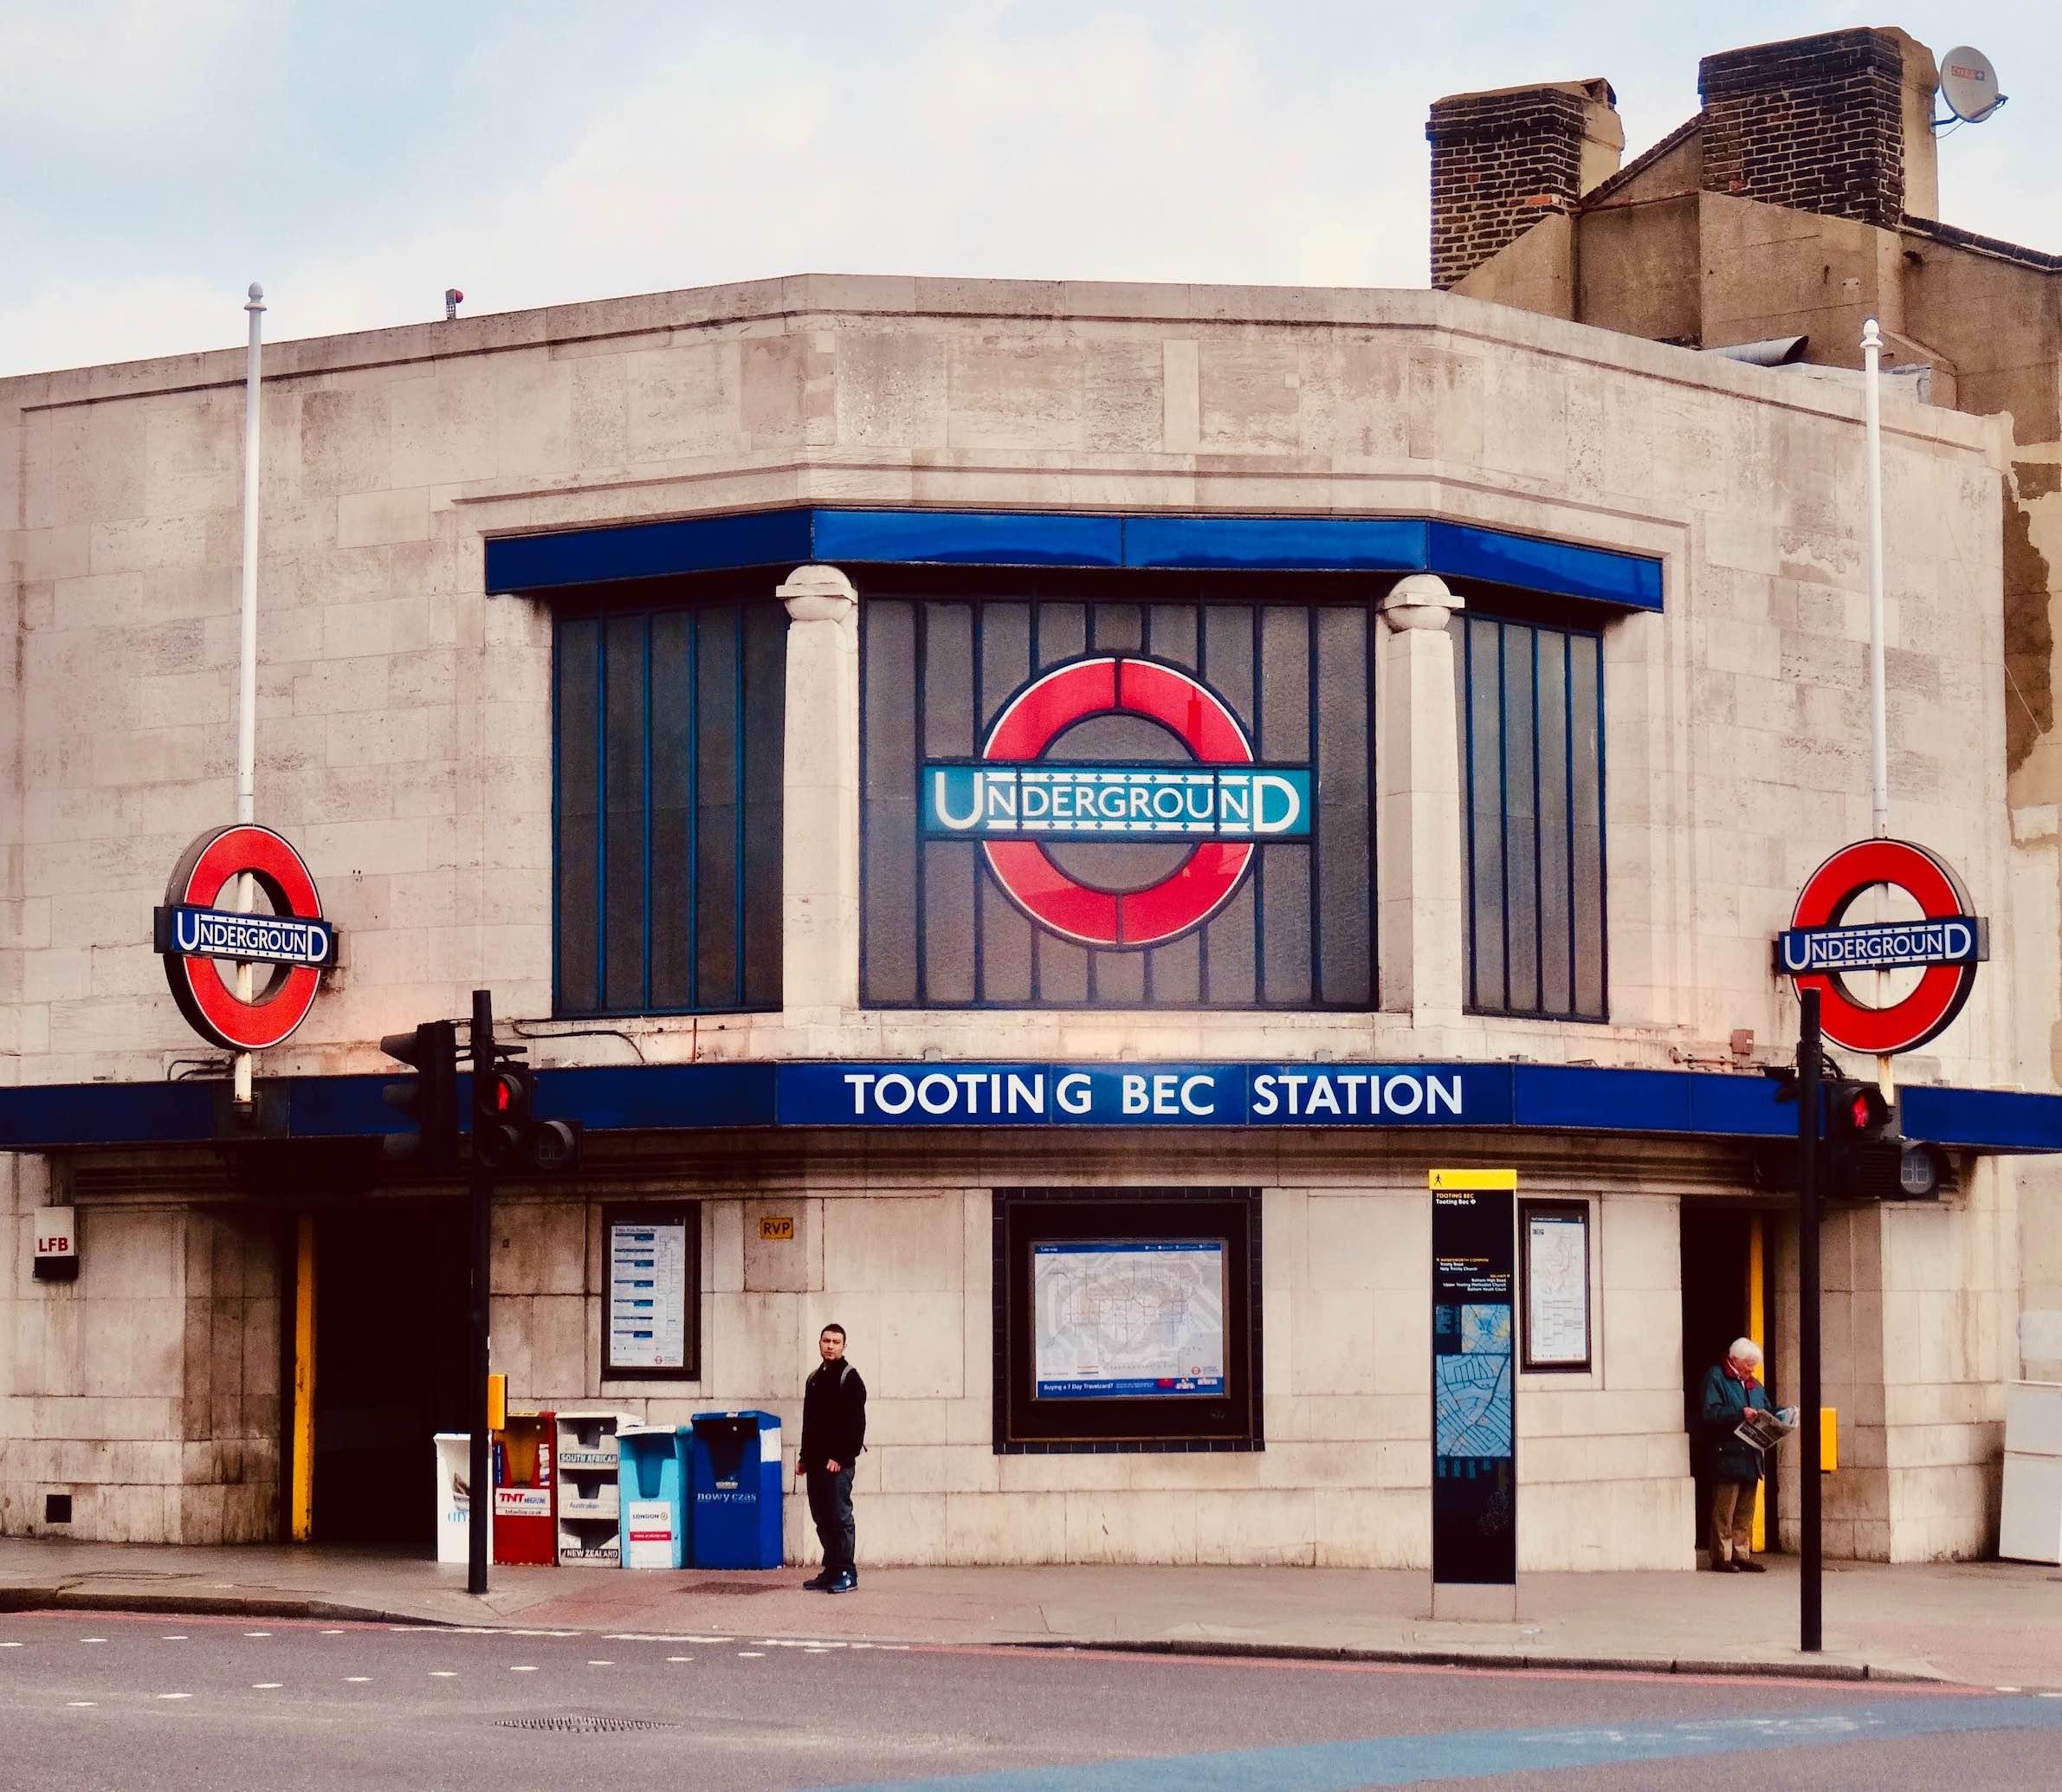 Tooting Bec Underground Station London